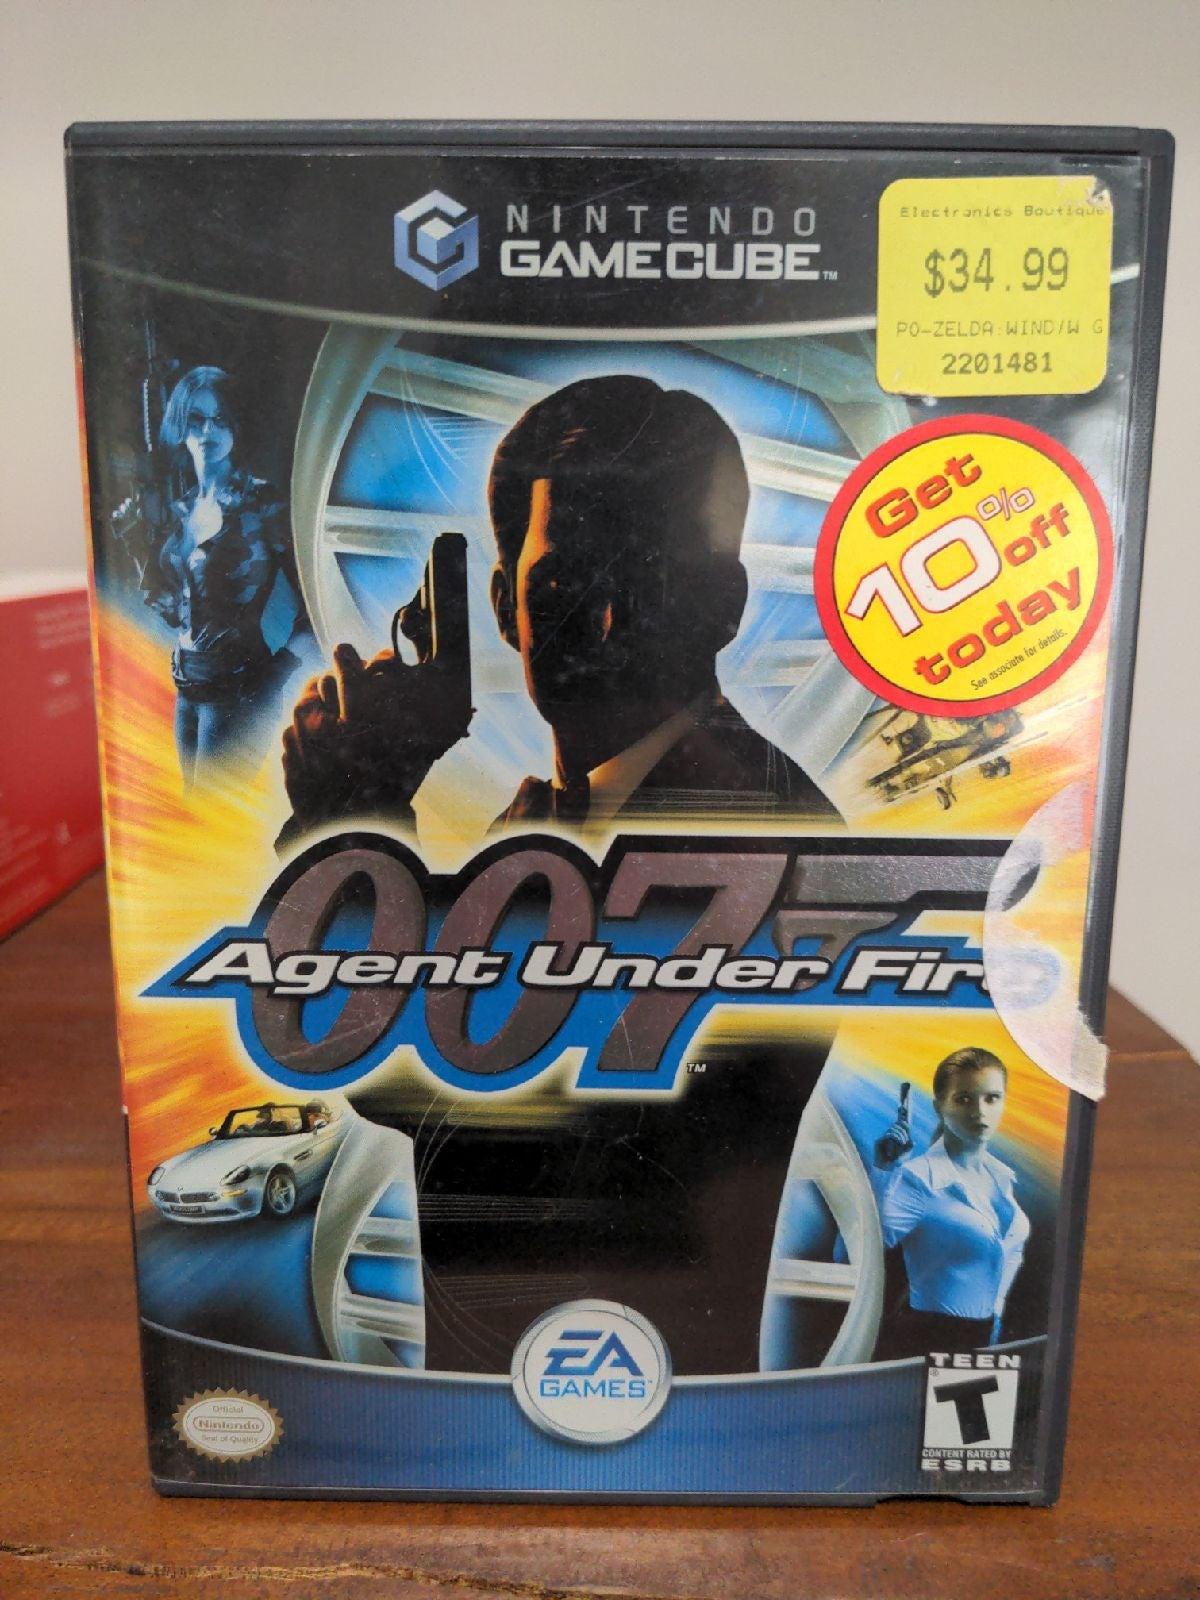 James Bond 007: Agent Under Fire on Nint